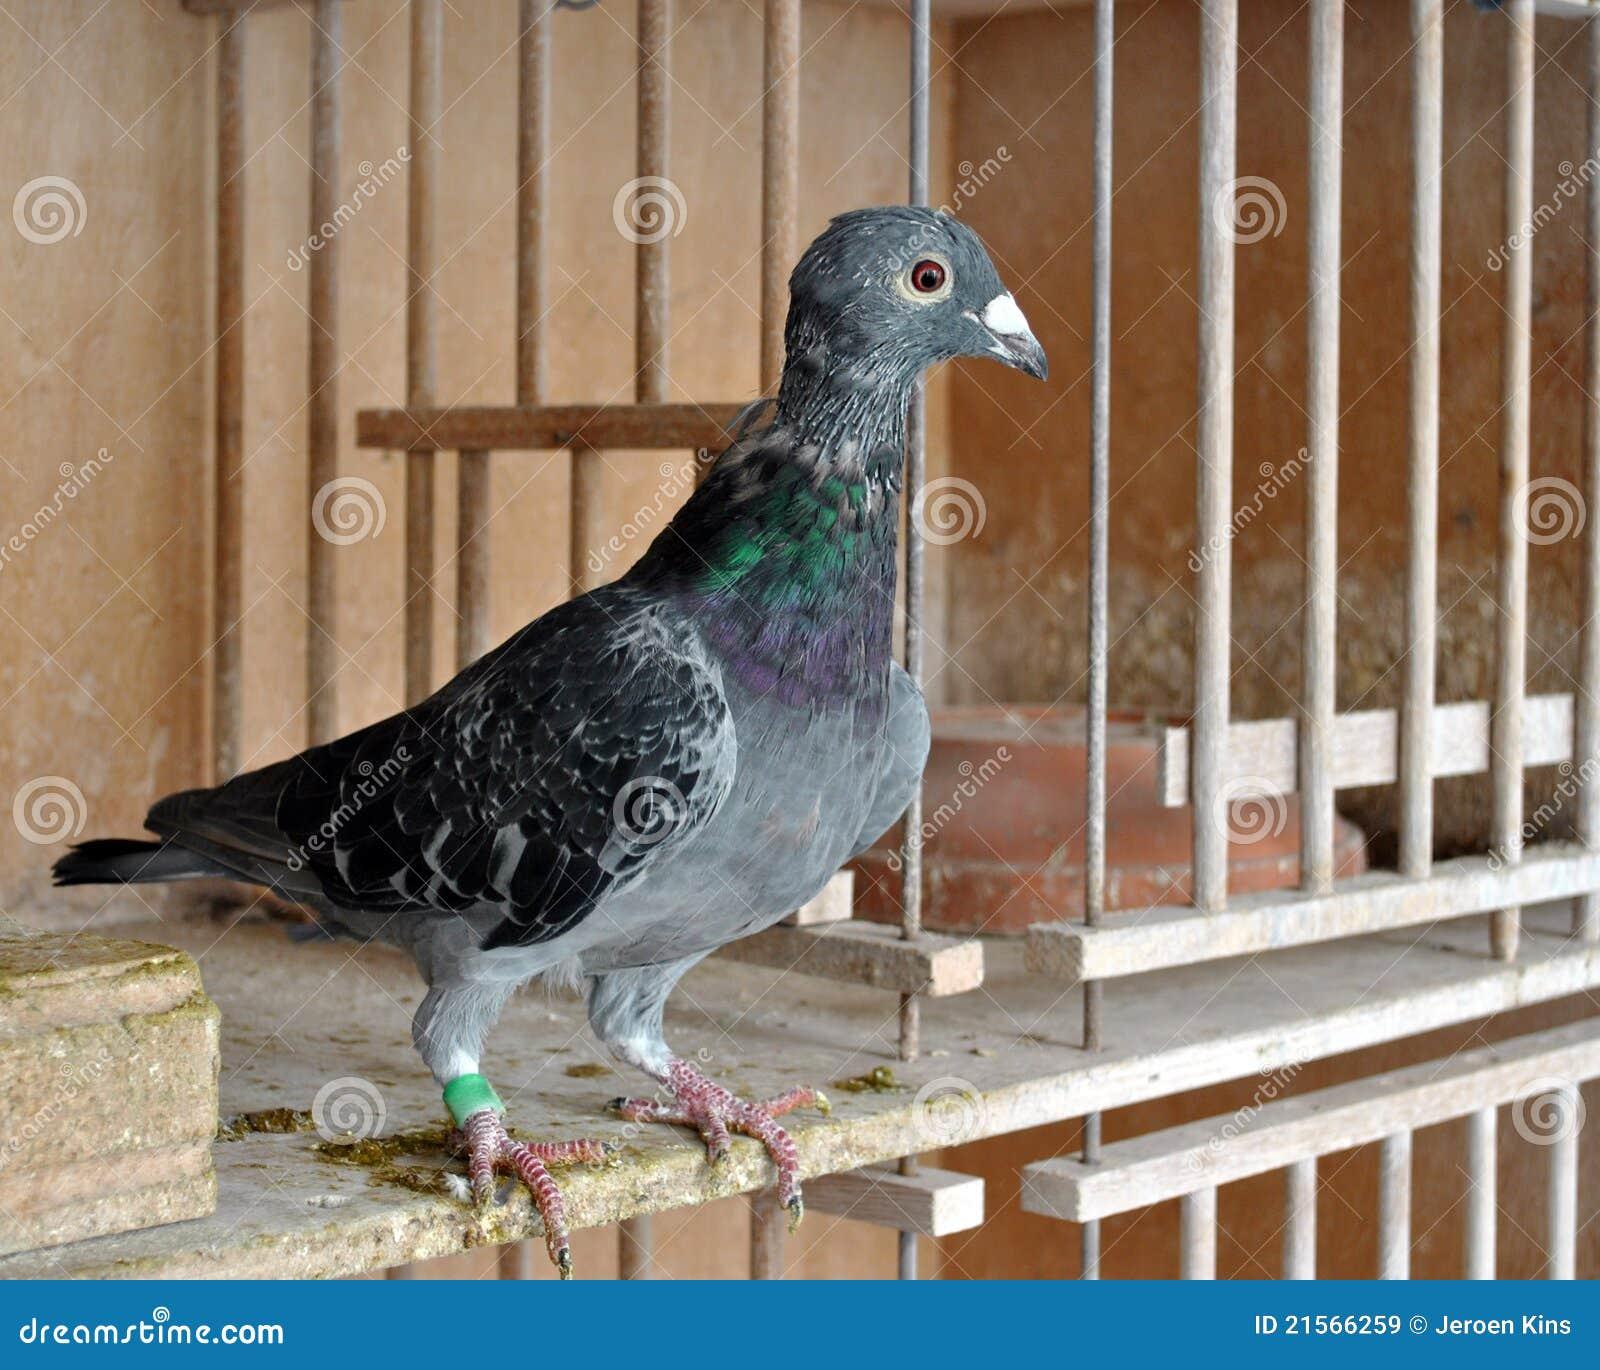 Pigeon free hd stock footage youtube.